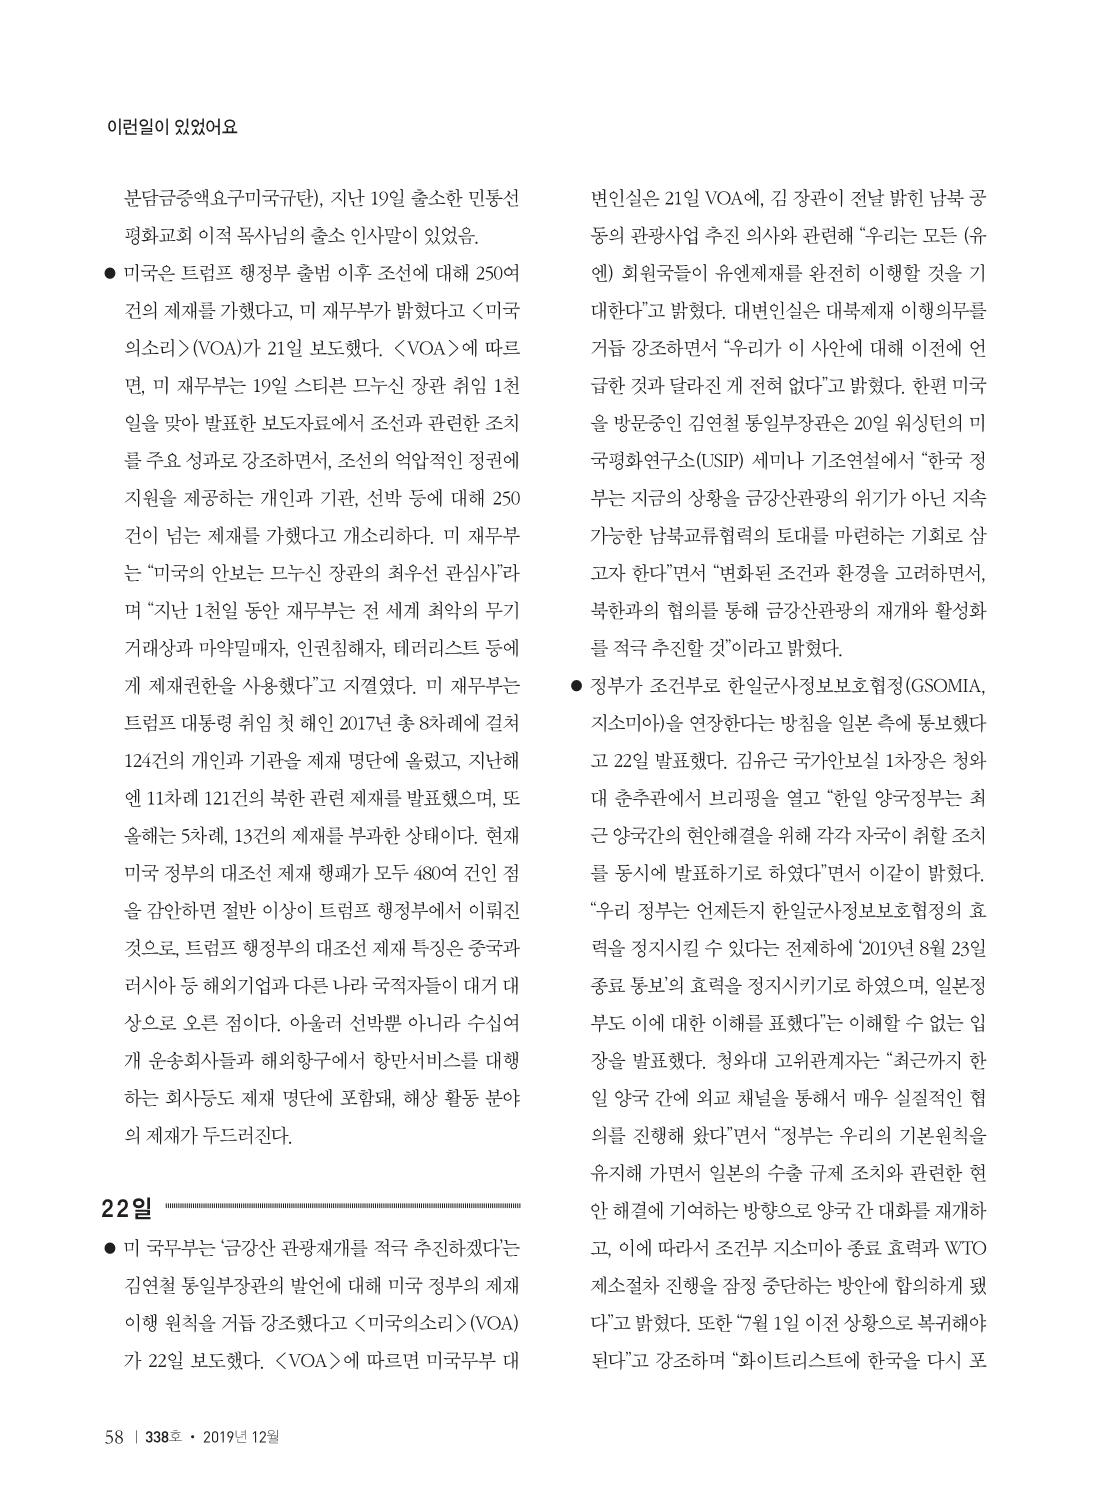 5802db1f-6a90-451c-ac2e-da2a23bee939.pdf-0060.jpg